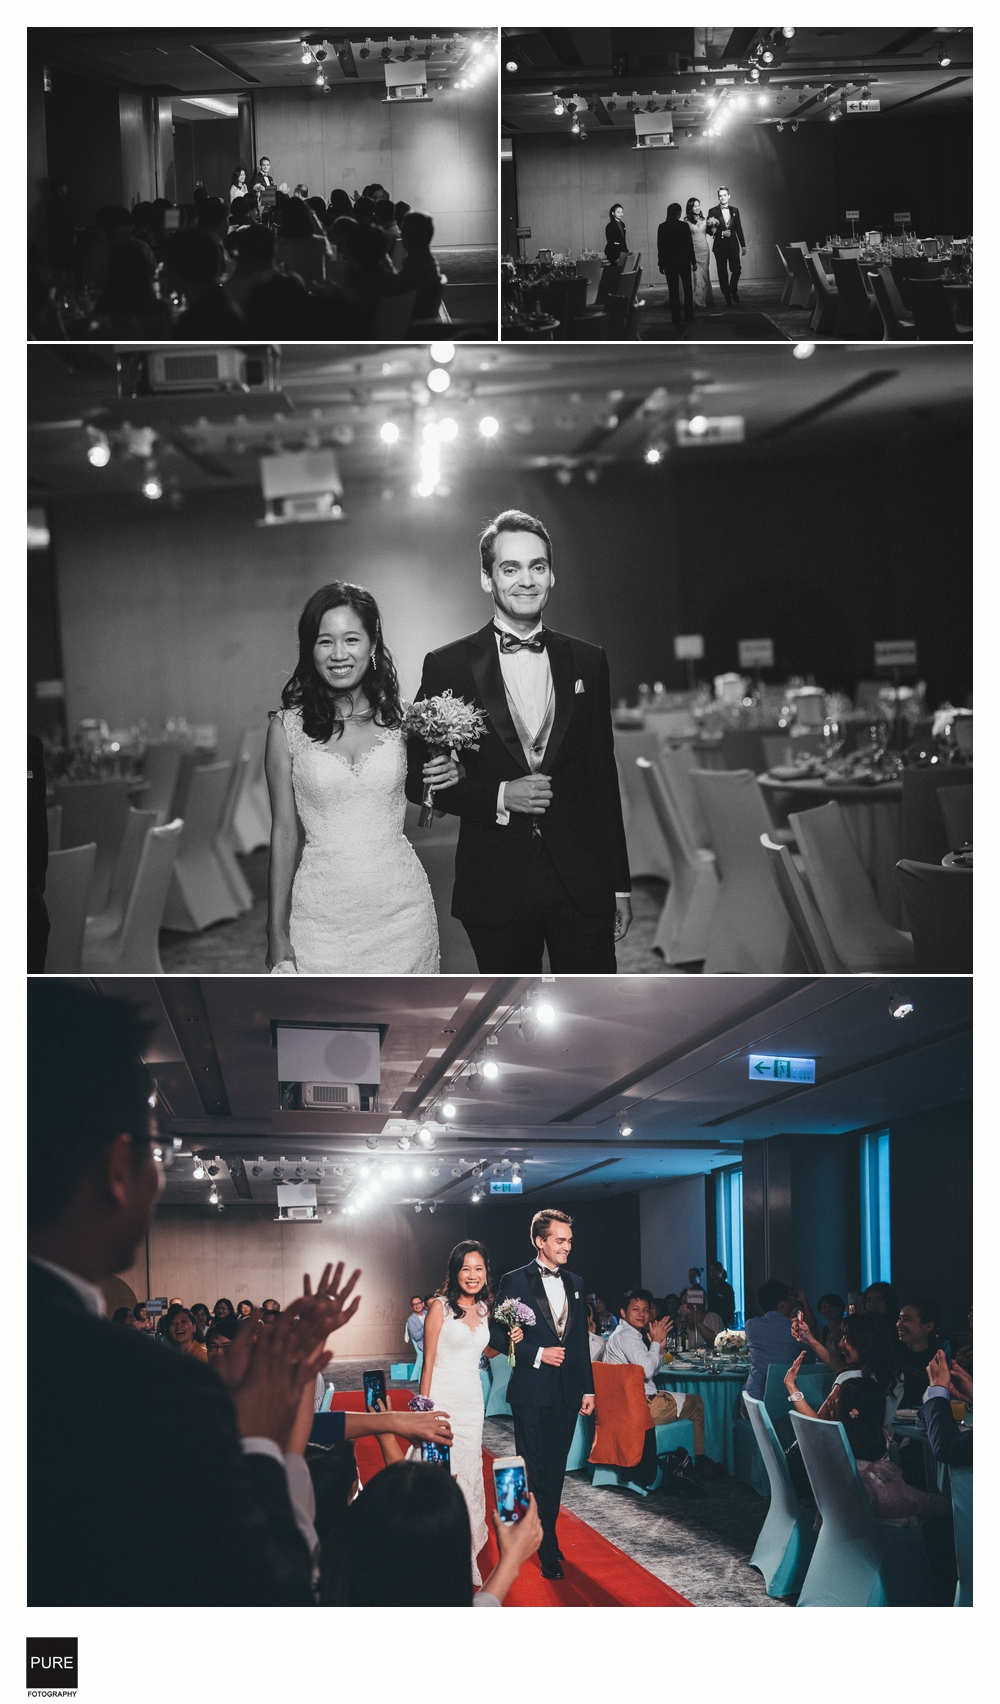 PUREFOTO_台灣婚禮平面攝影wedding_PURE婚禮攝影Wealthy-寒舍艾美